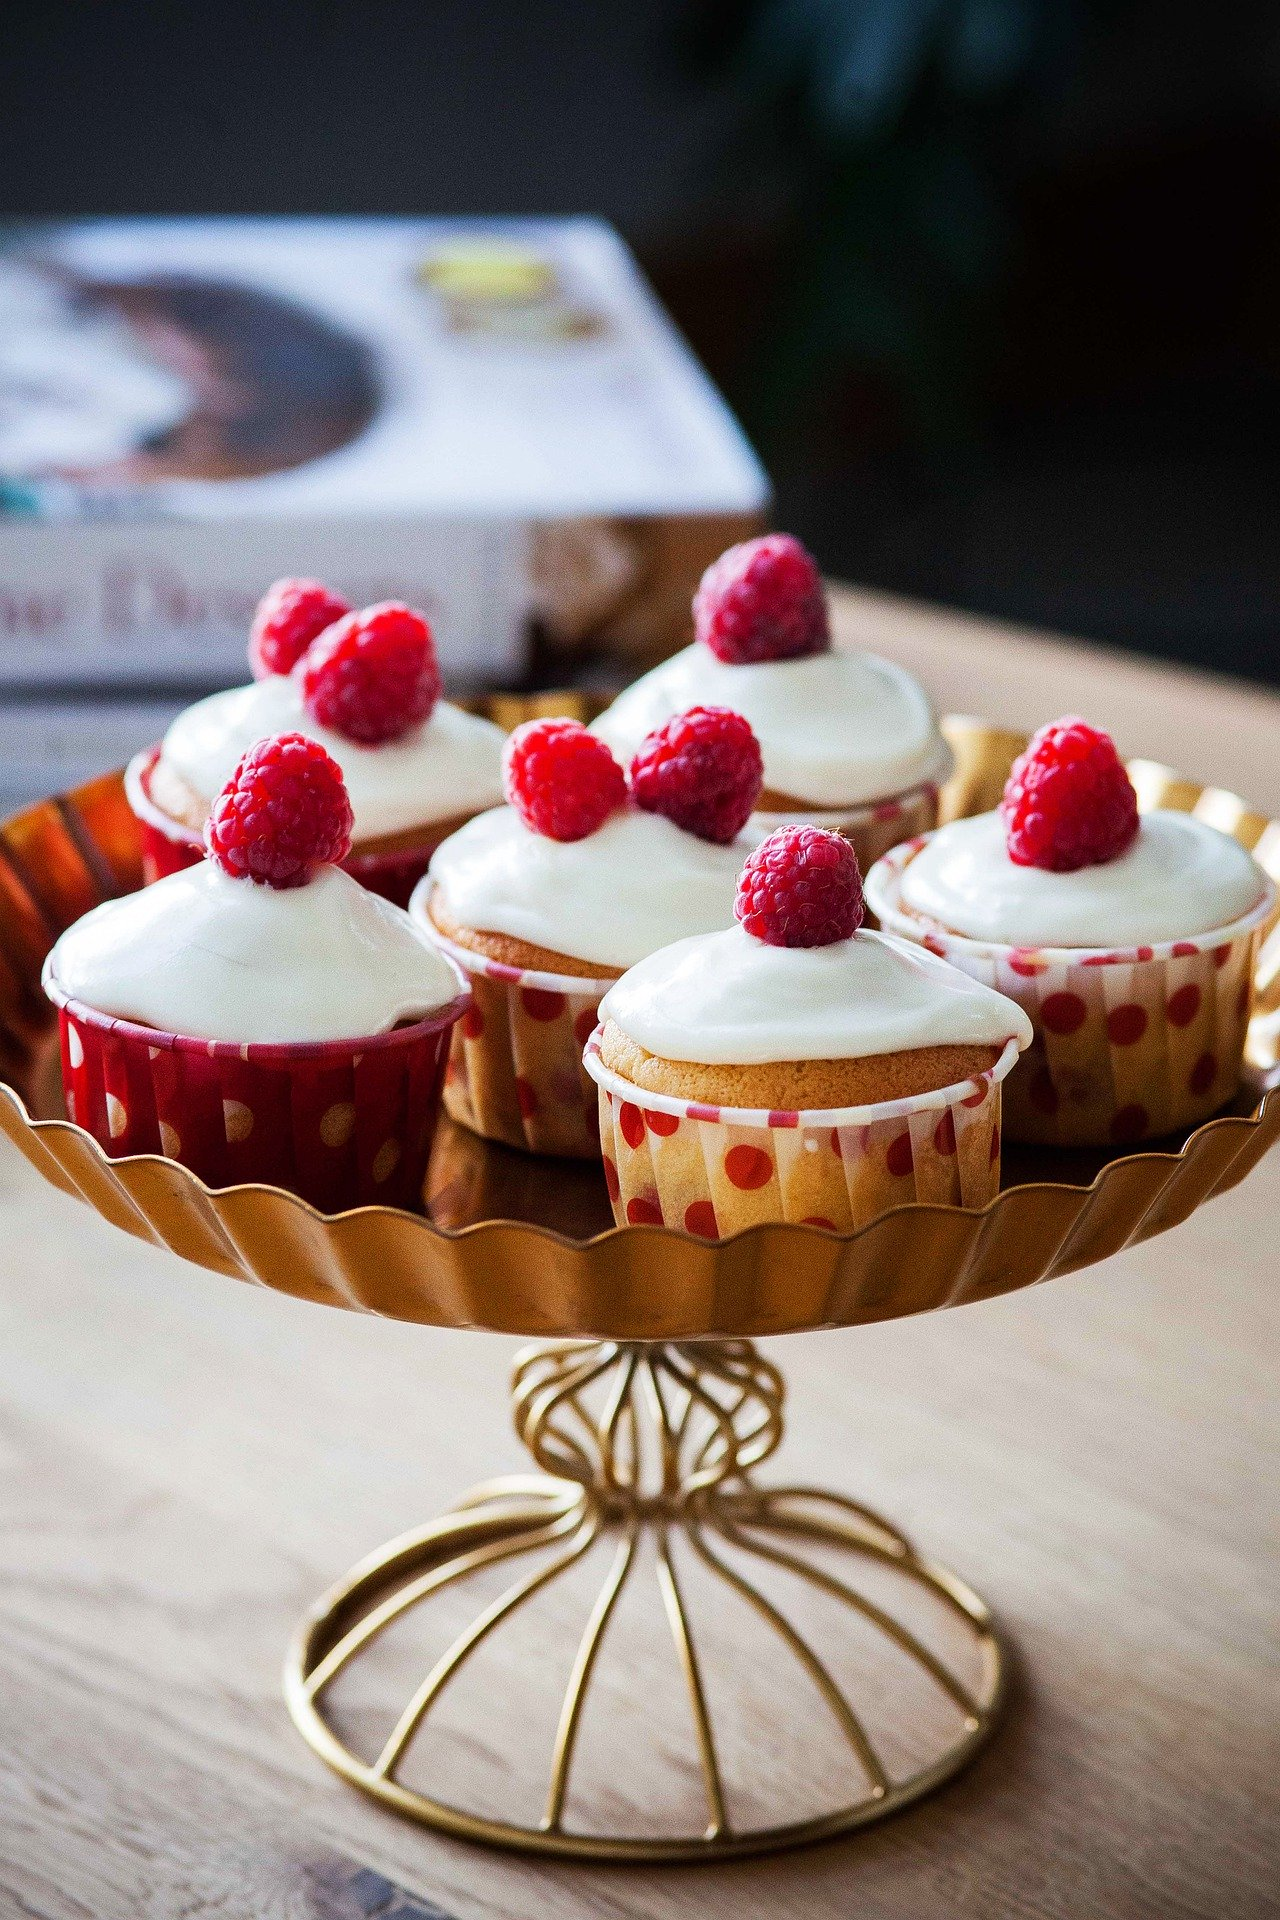 cupcakes-4944589_1920